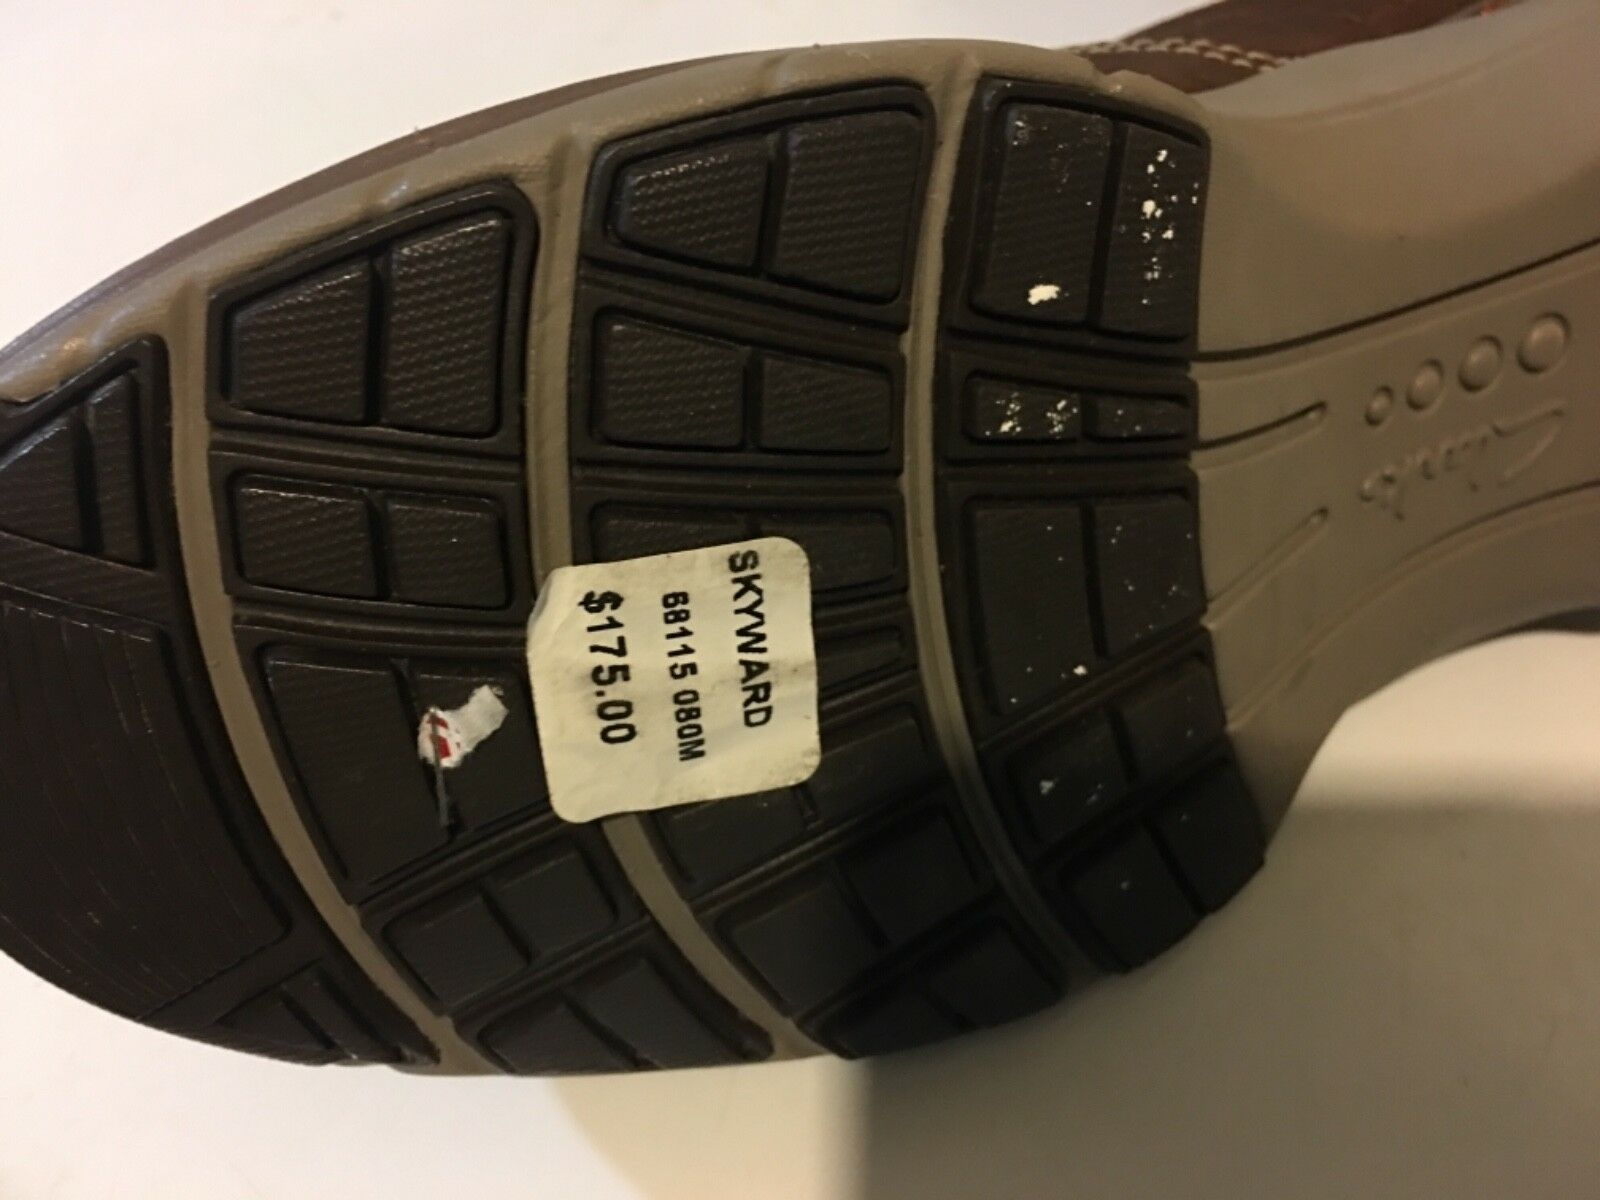 Scarpe ANTI-FRICTION casual da uomo  Clarks ACTIVE AIR VENT ANTI-FRICTION Scarpe TECHNOLOGY Leather Shoe uomo  8 8b8026